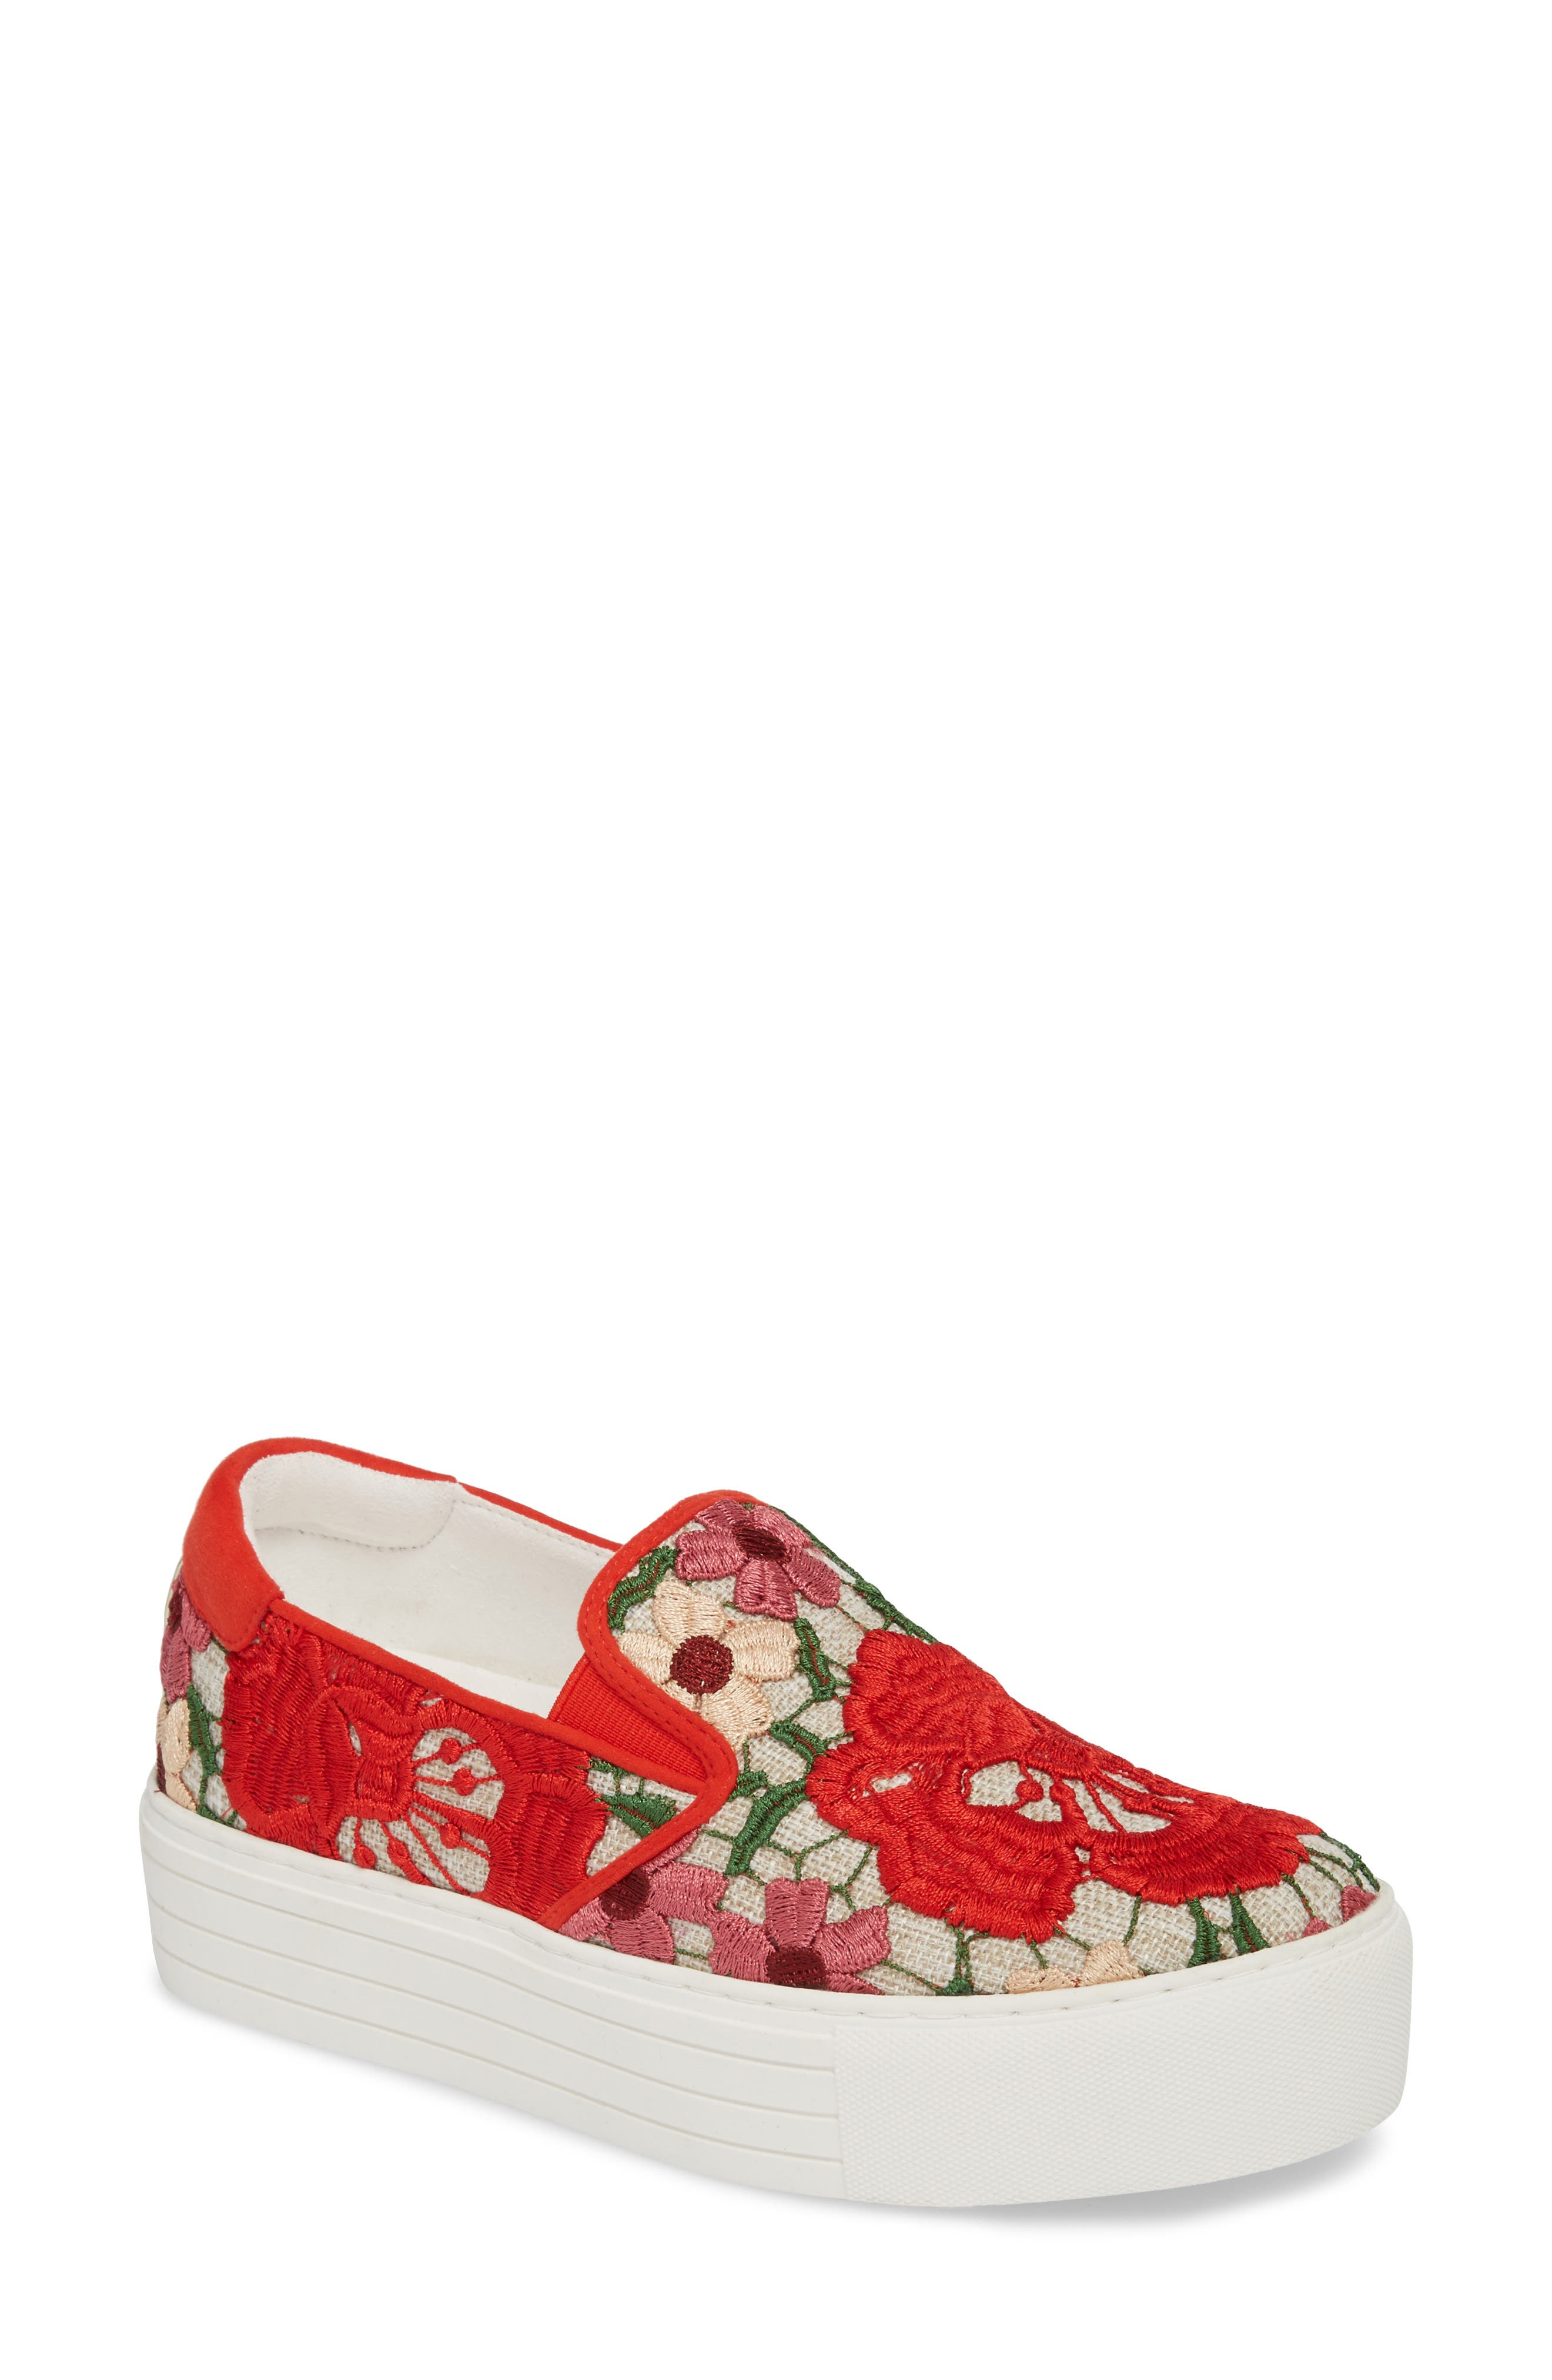 Joanie Slip-On Platform Sneaker,                             Main thumbnail 4, color,